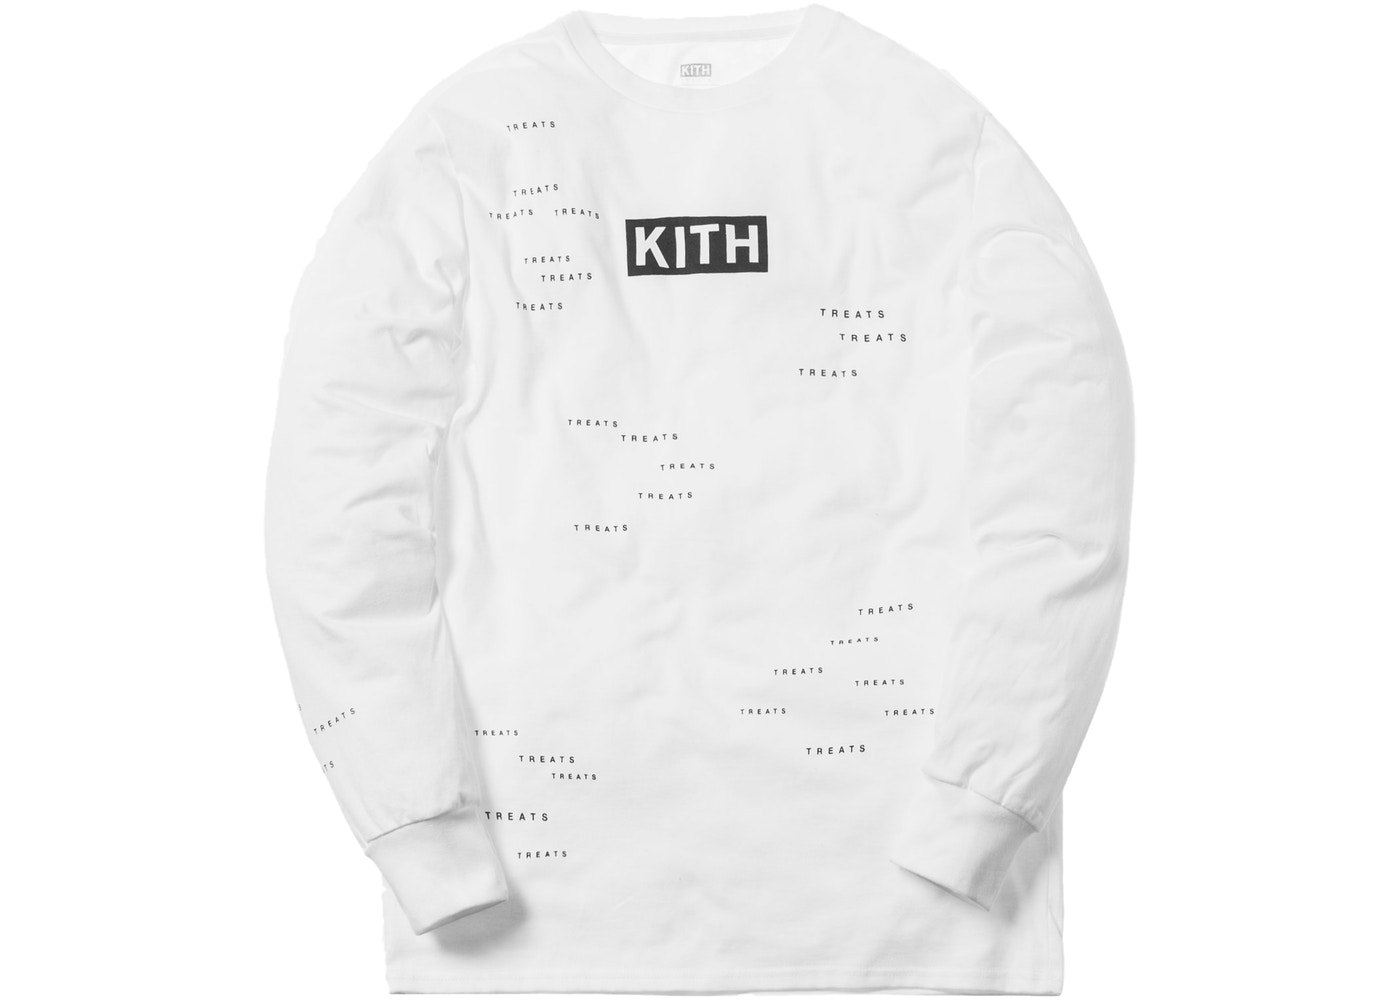 83427ff3 Streetwear - Kith T-Shirts - Volatility